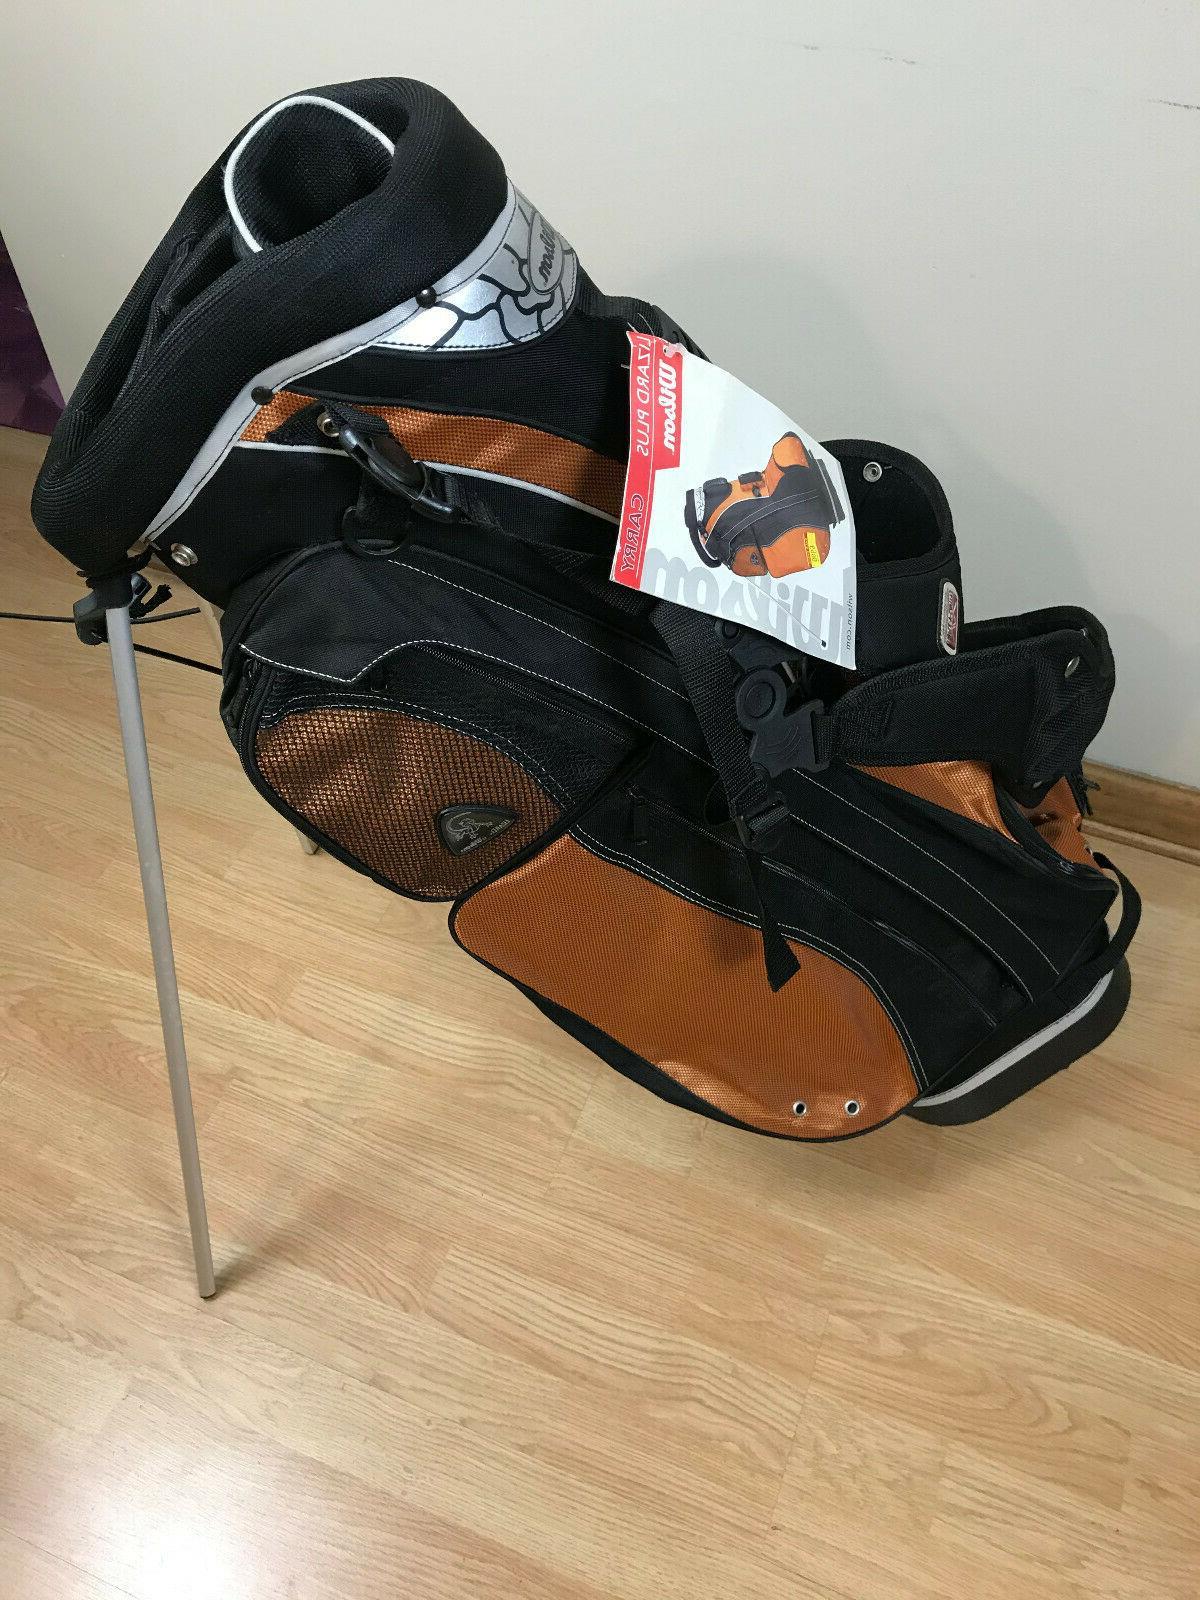 lizard plus stand carry golf bag copper